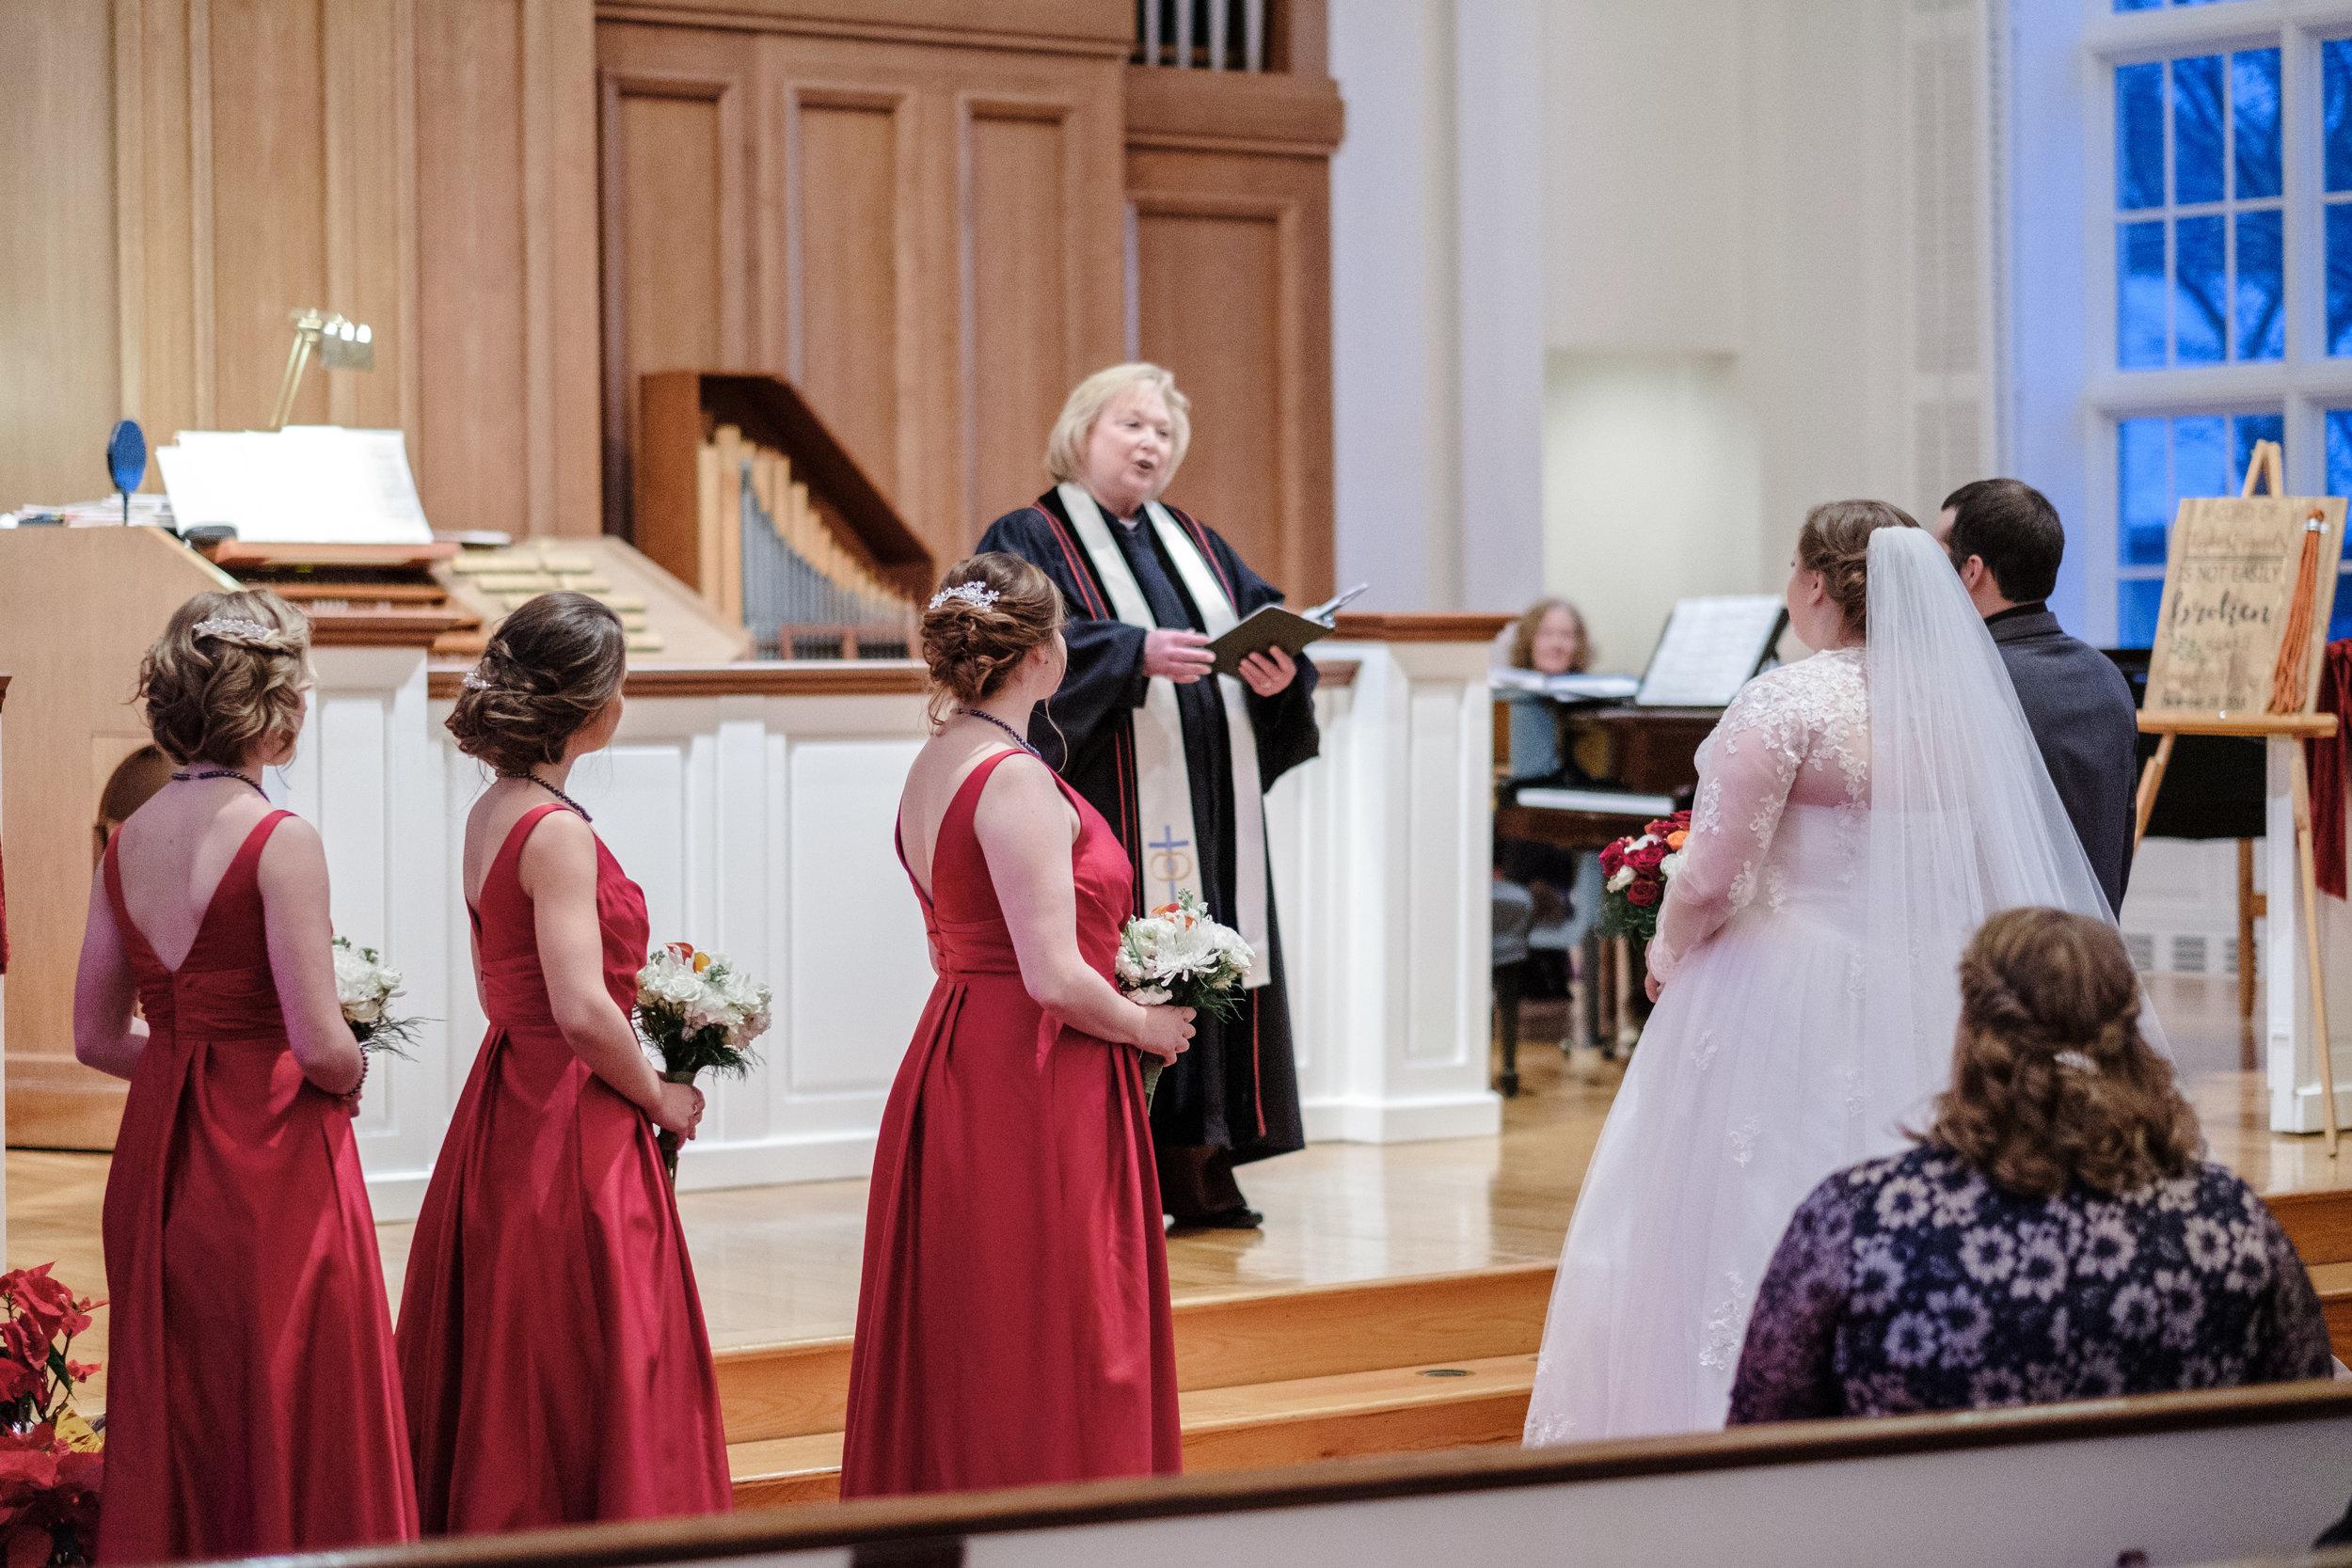 18-12-28 Corinne-Henry-Pavilion-Wedding-270.jpg